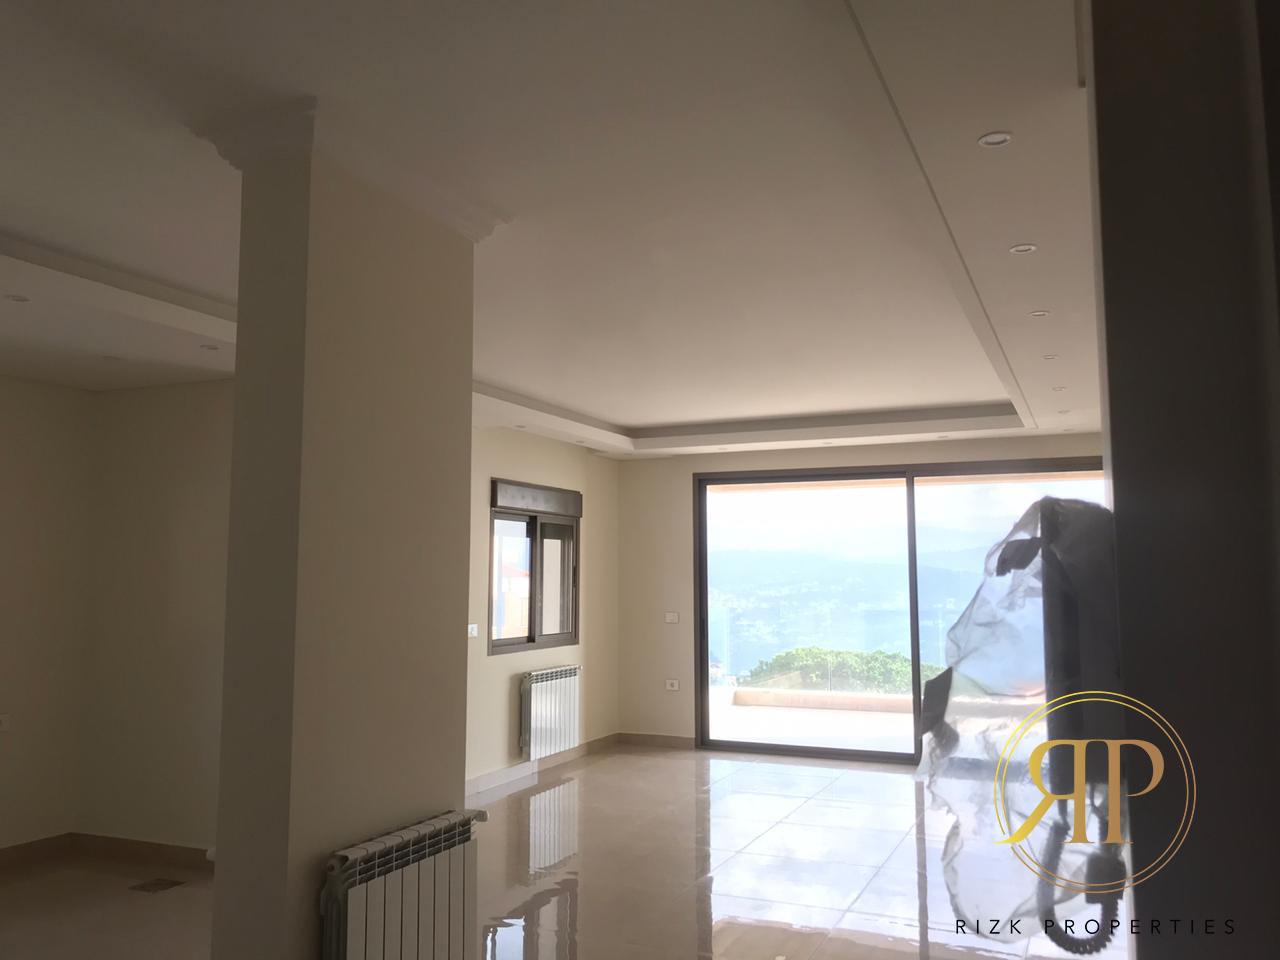 Catchy Apartments in Daher l Souwen !!